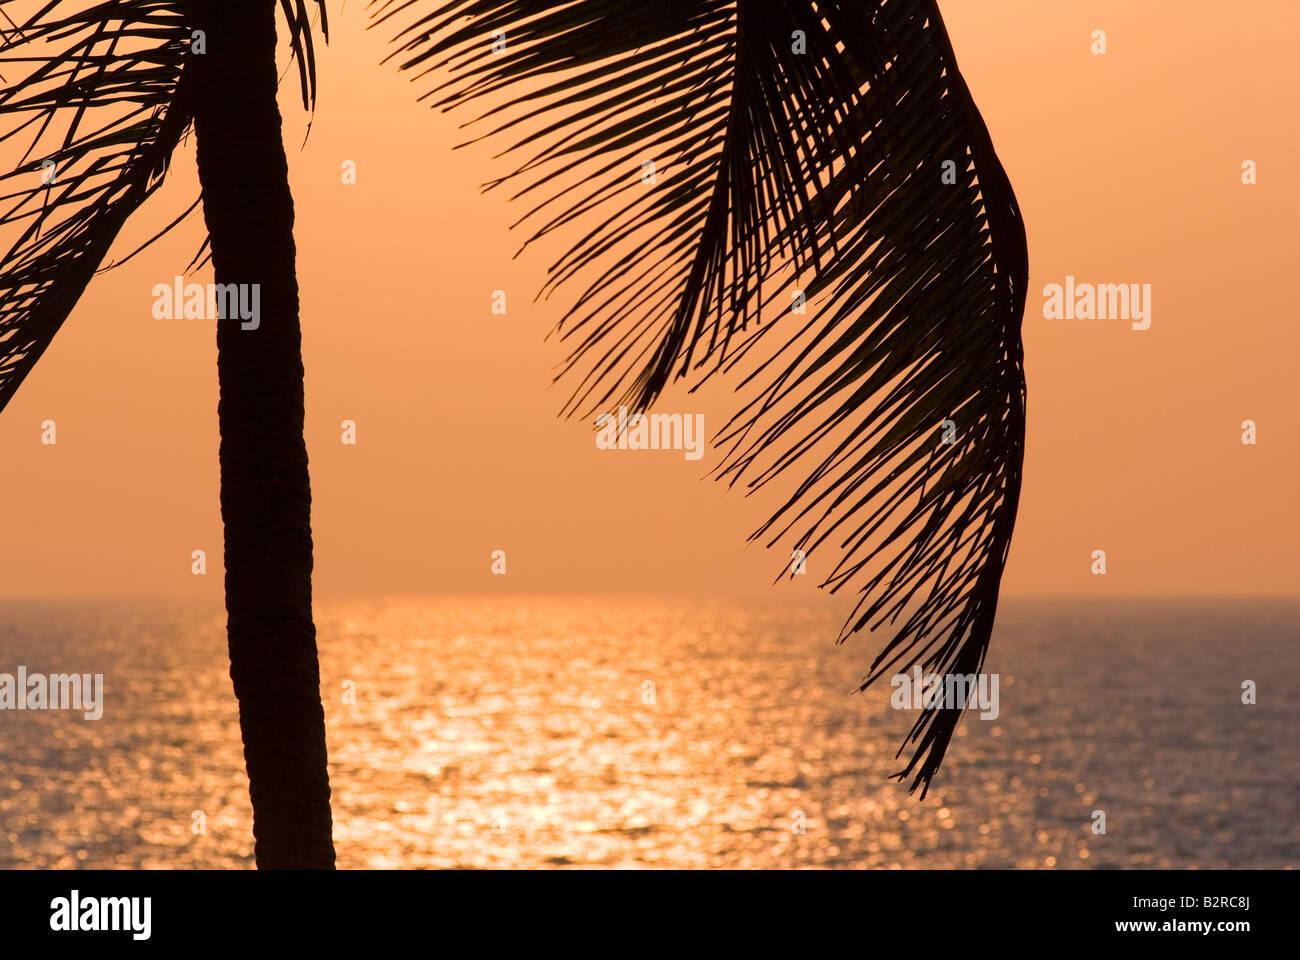 Palm Trees, Arambol, Goa, India, Subcontinent, Asia - Stock Image